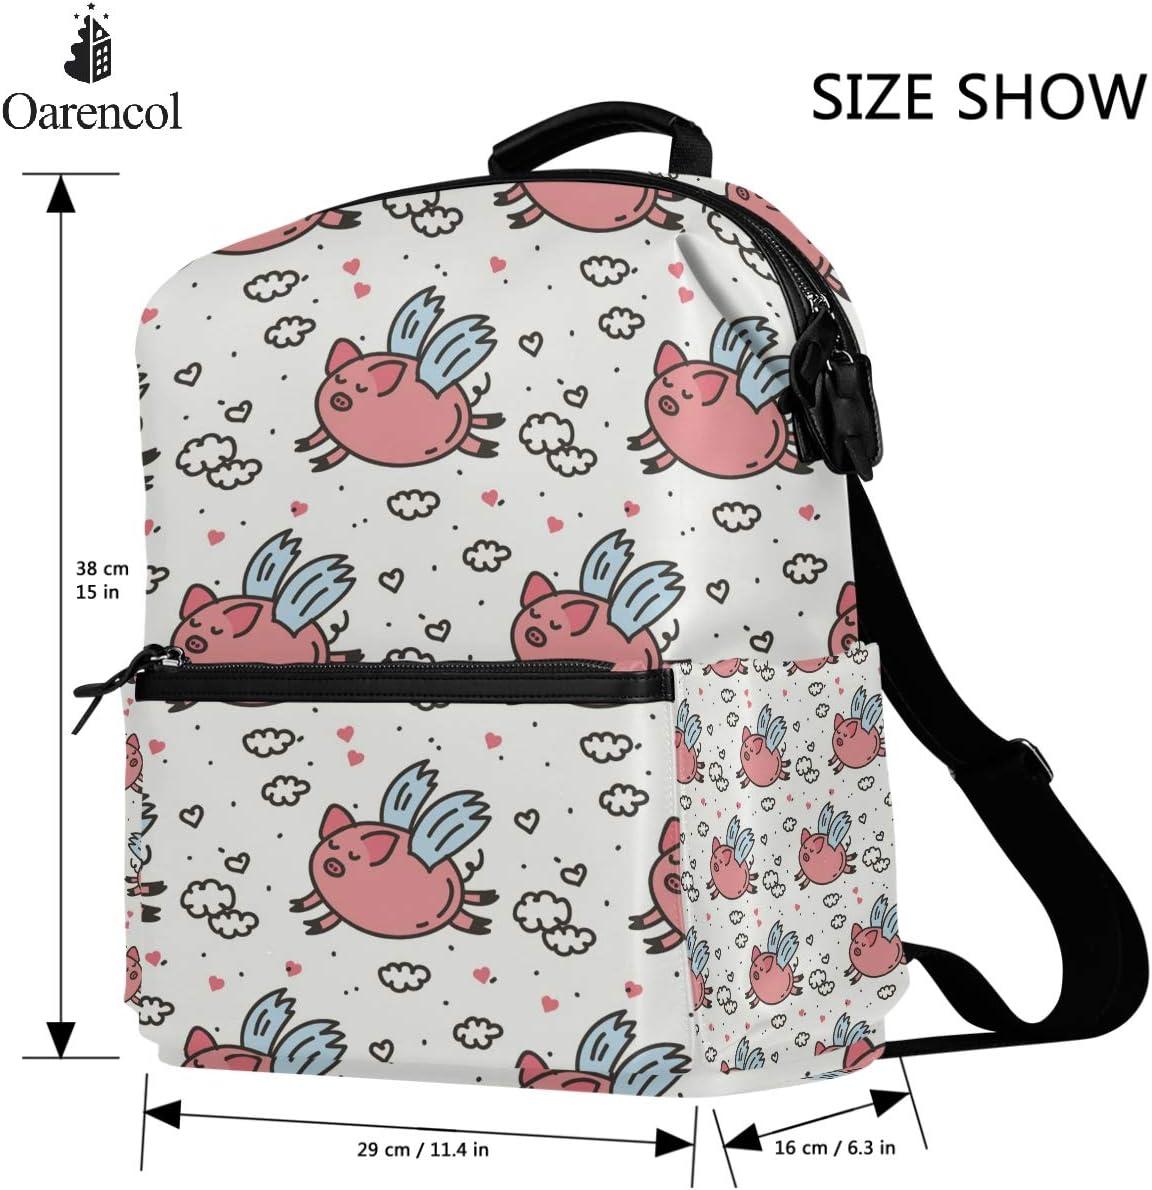 Oarencol Pink Fly Pig Polka Dot Cloud Backpack Cute Cartoon Animal Heart School Book Bag Travel Hiking Camping Laptop Daypack for Boys Girls Kids Teens